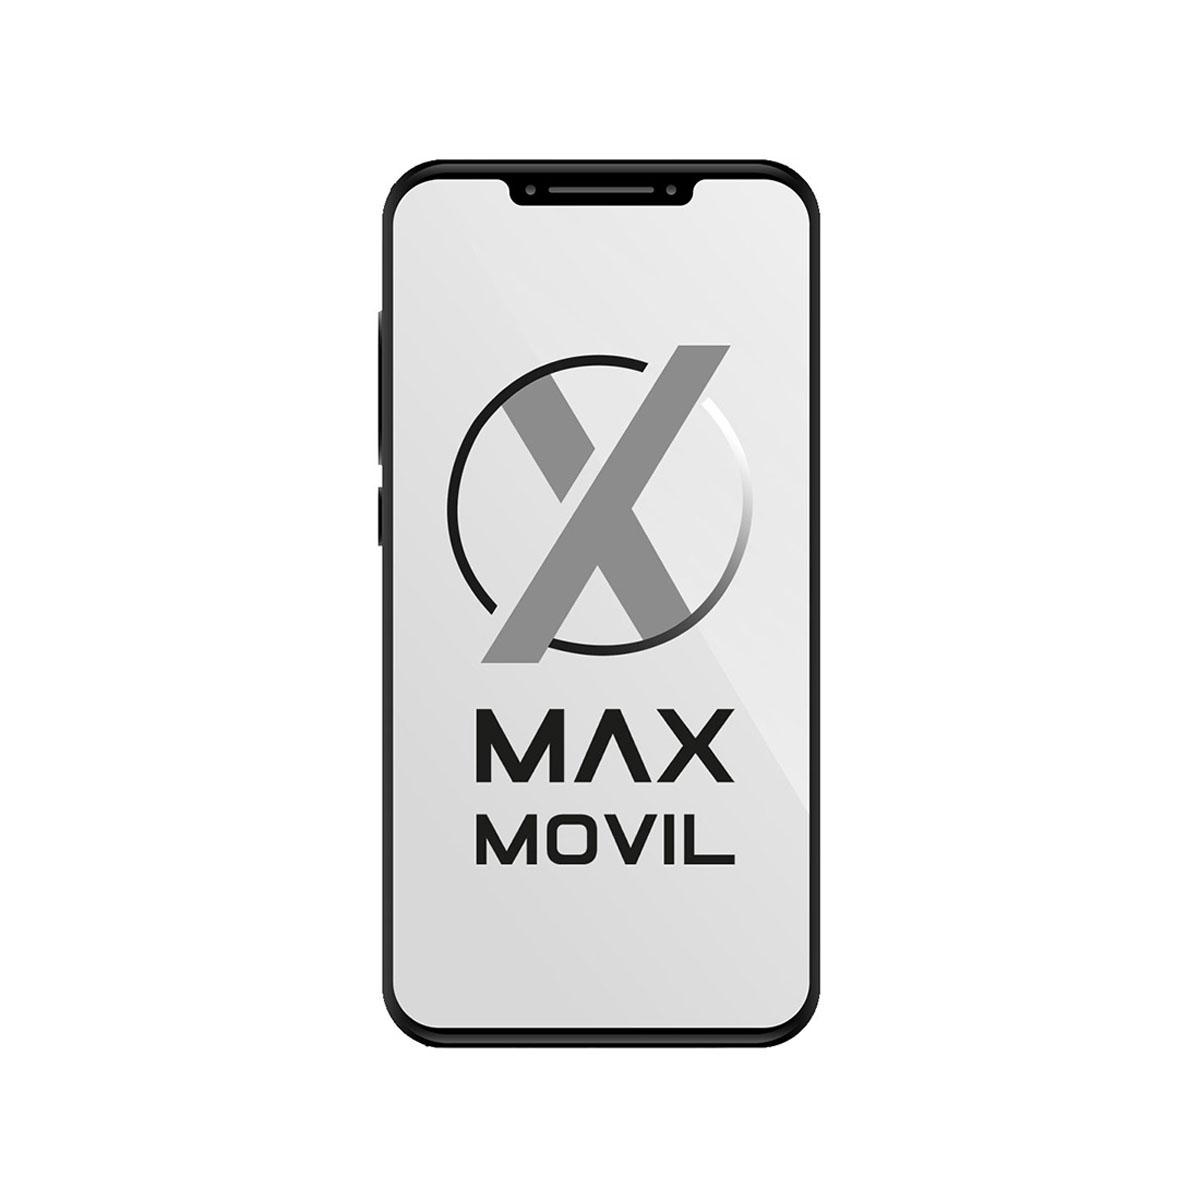 Telefono inalambrico dect Panasonic KX-TG6751SPB + repetidor largo alcance